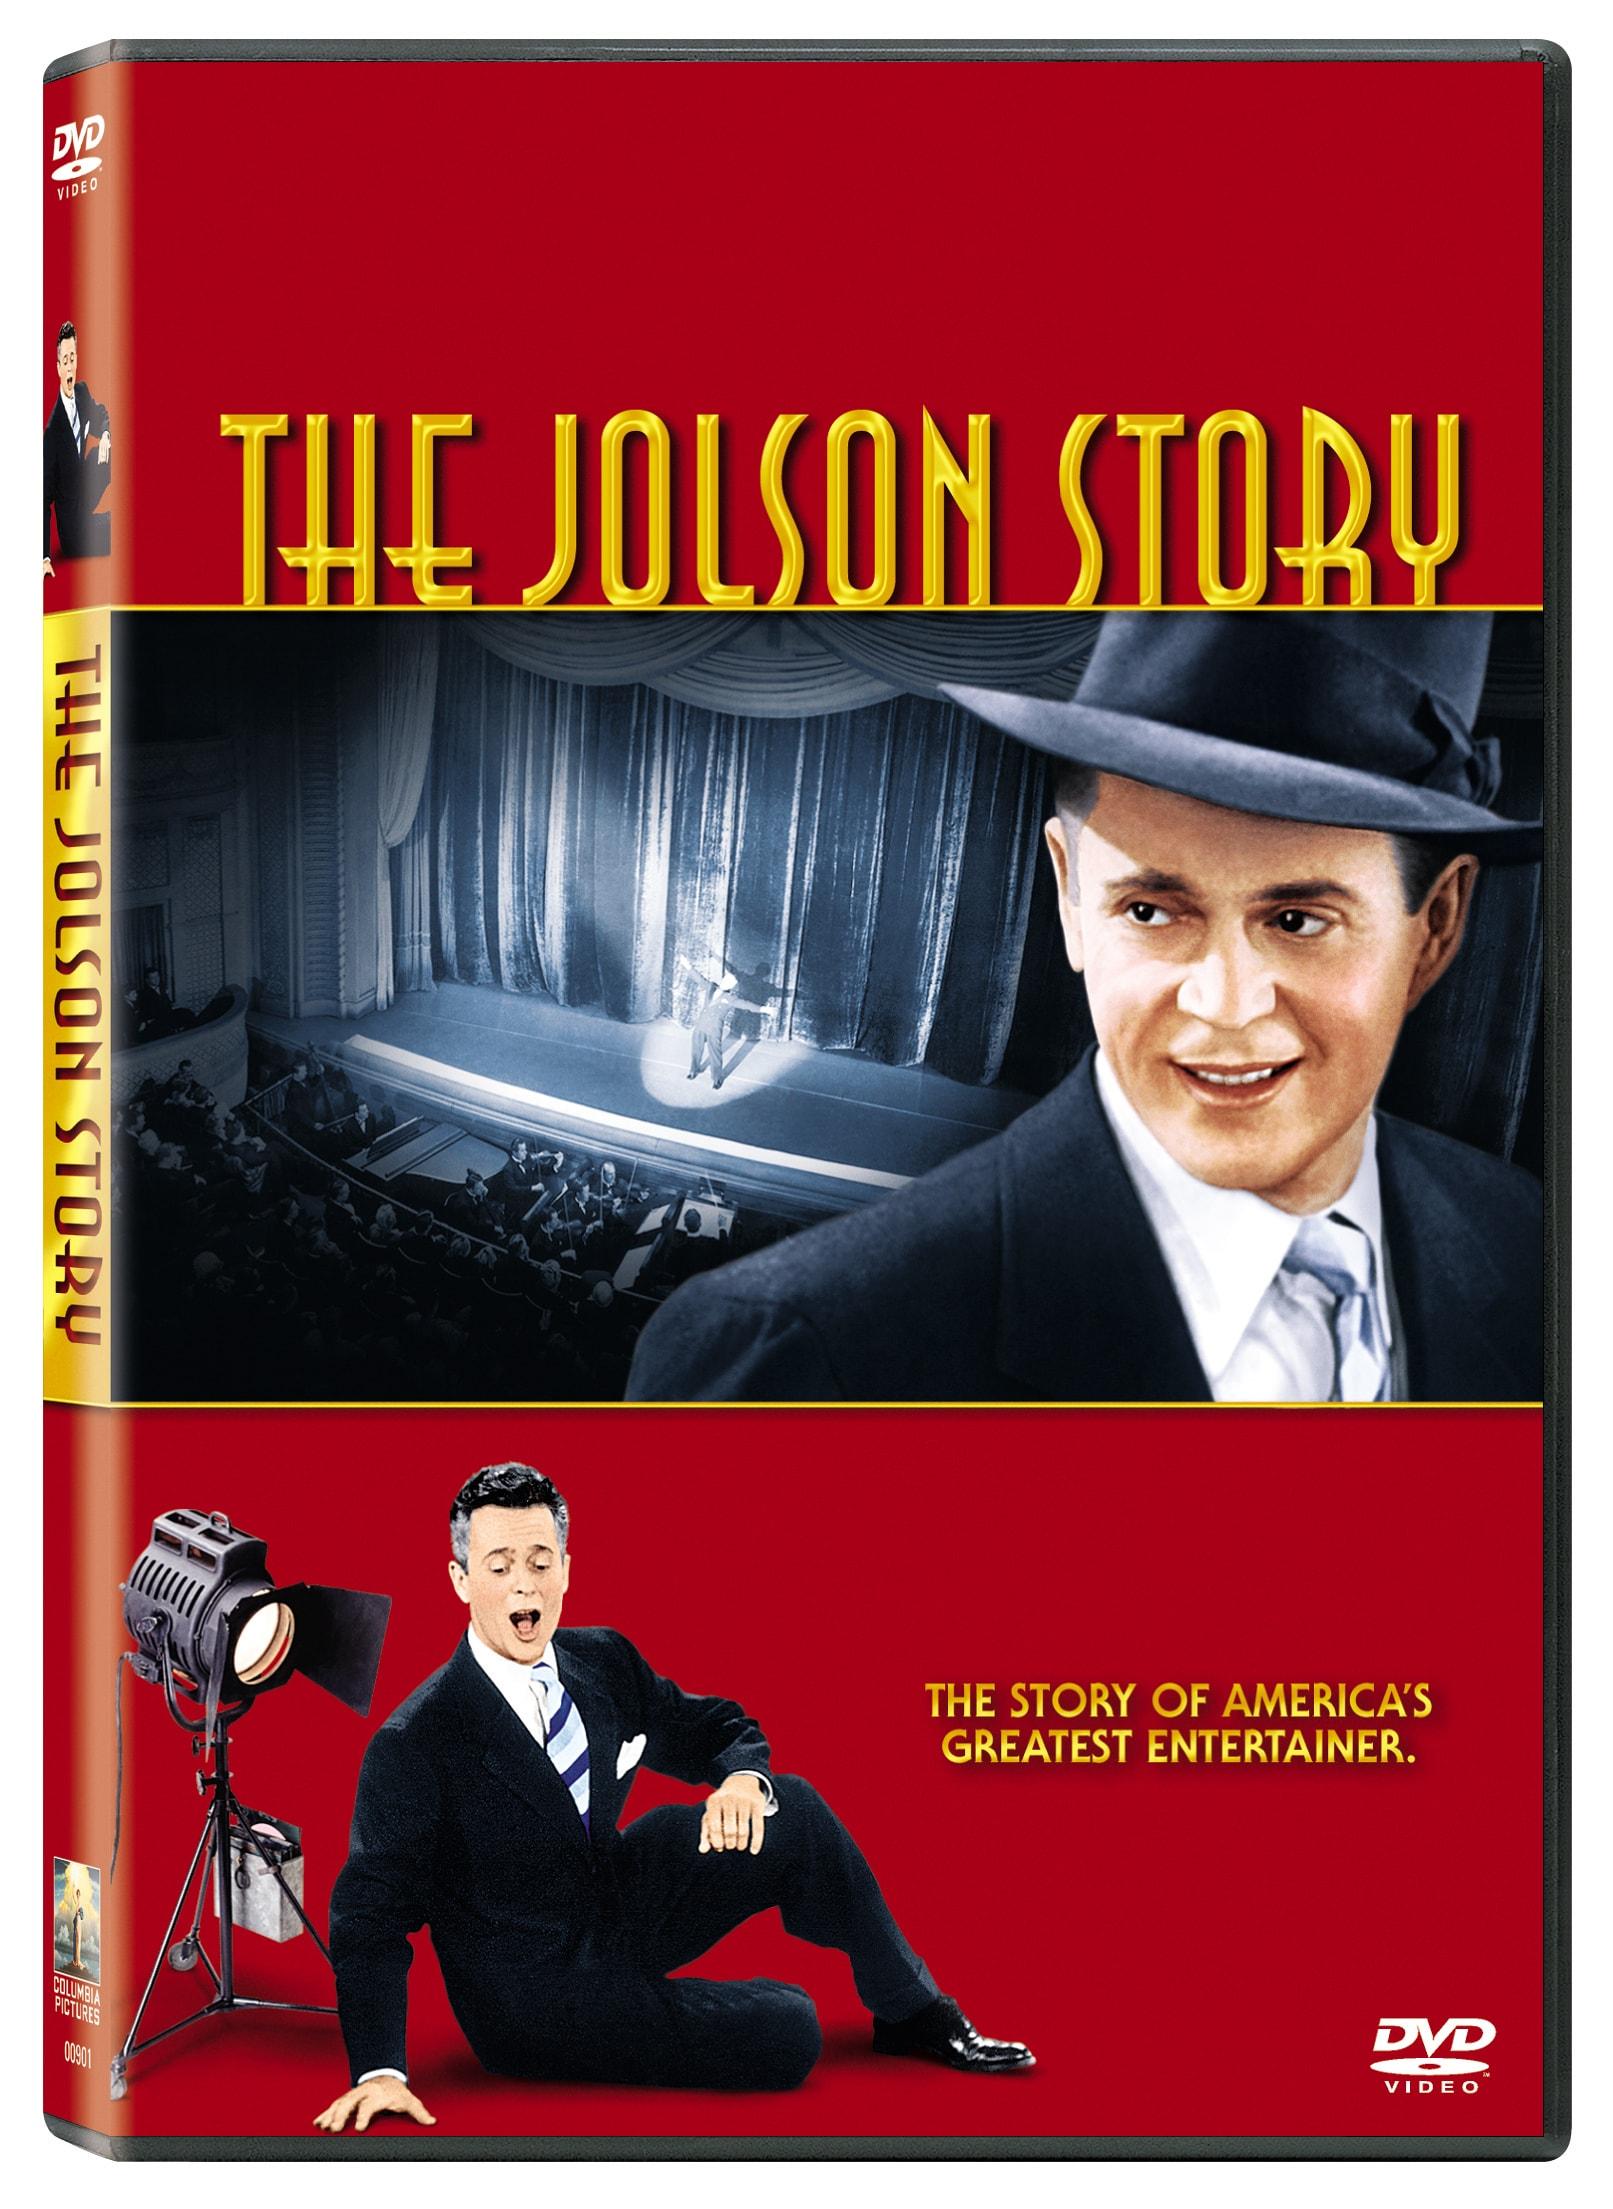 Jolson Story (DVD)